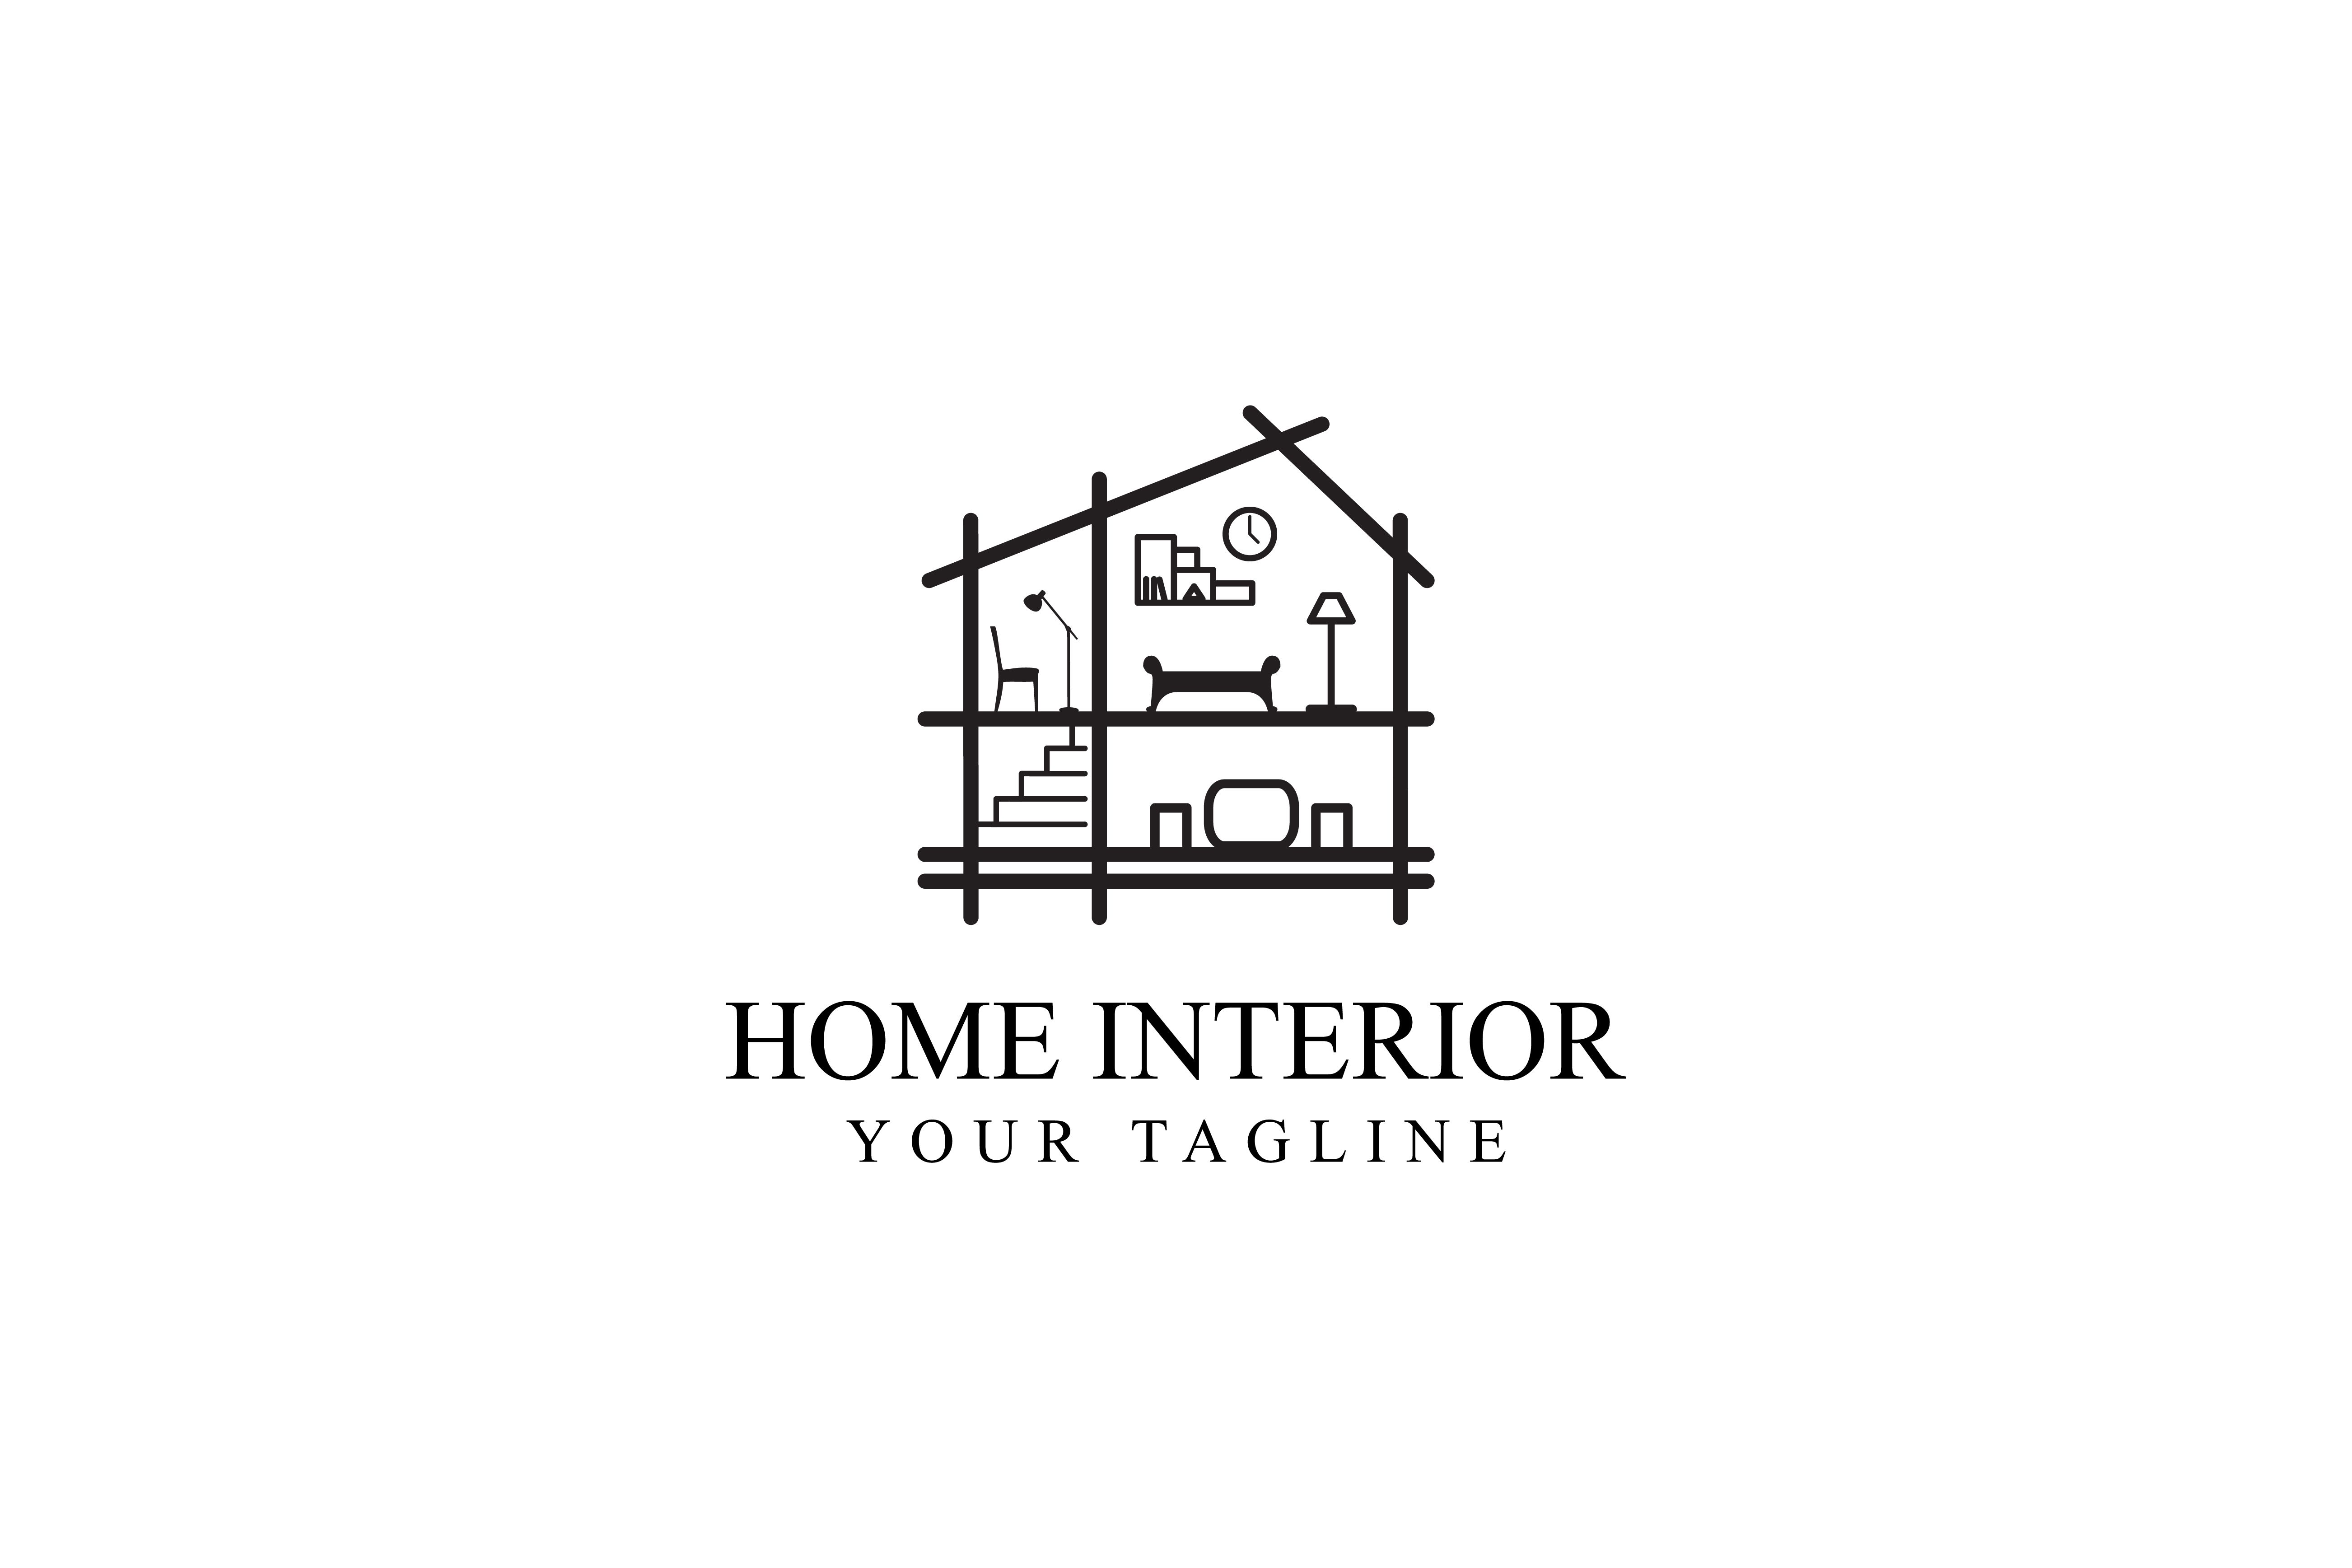 Home Interior Logo Design Graphic By Sabavector Creative Fabrica In 2020 Interior Designer Logo Interior Logo Design Studio Logo